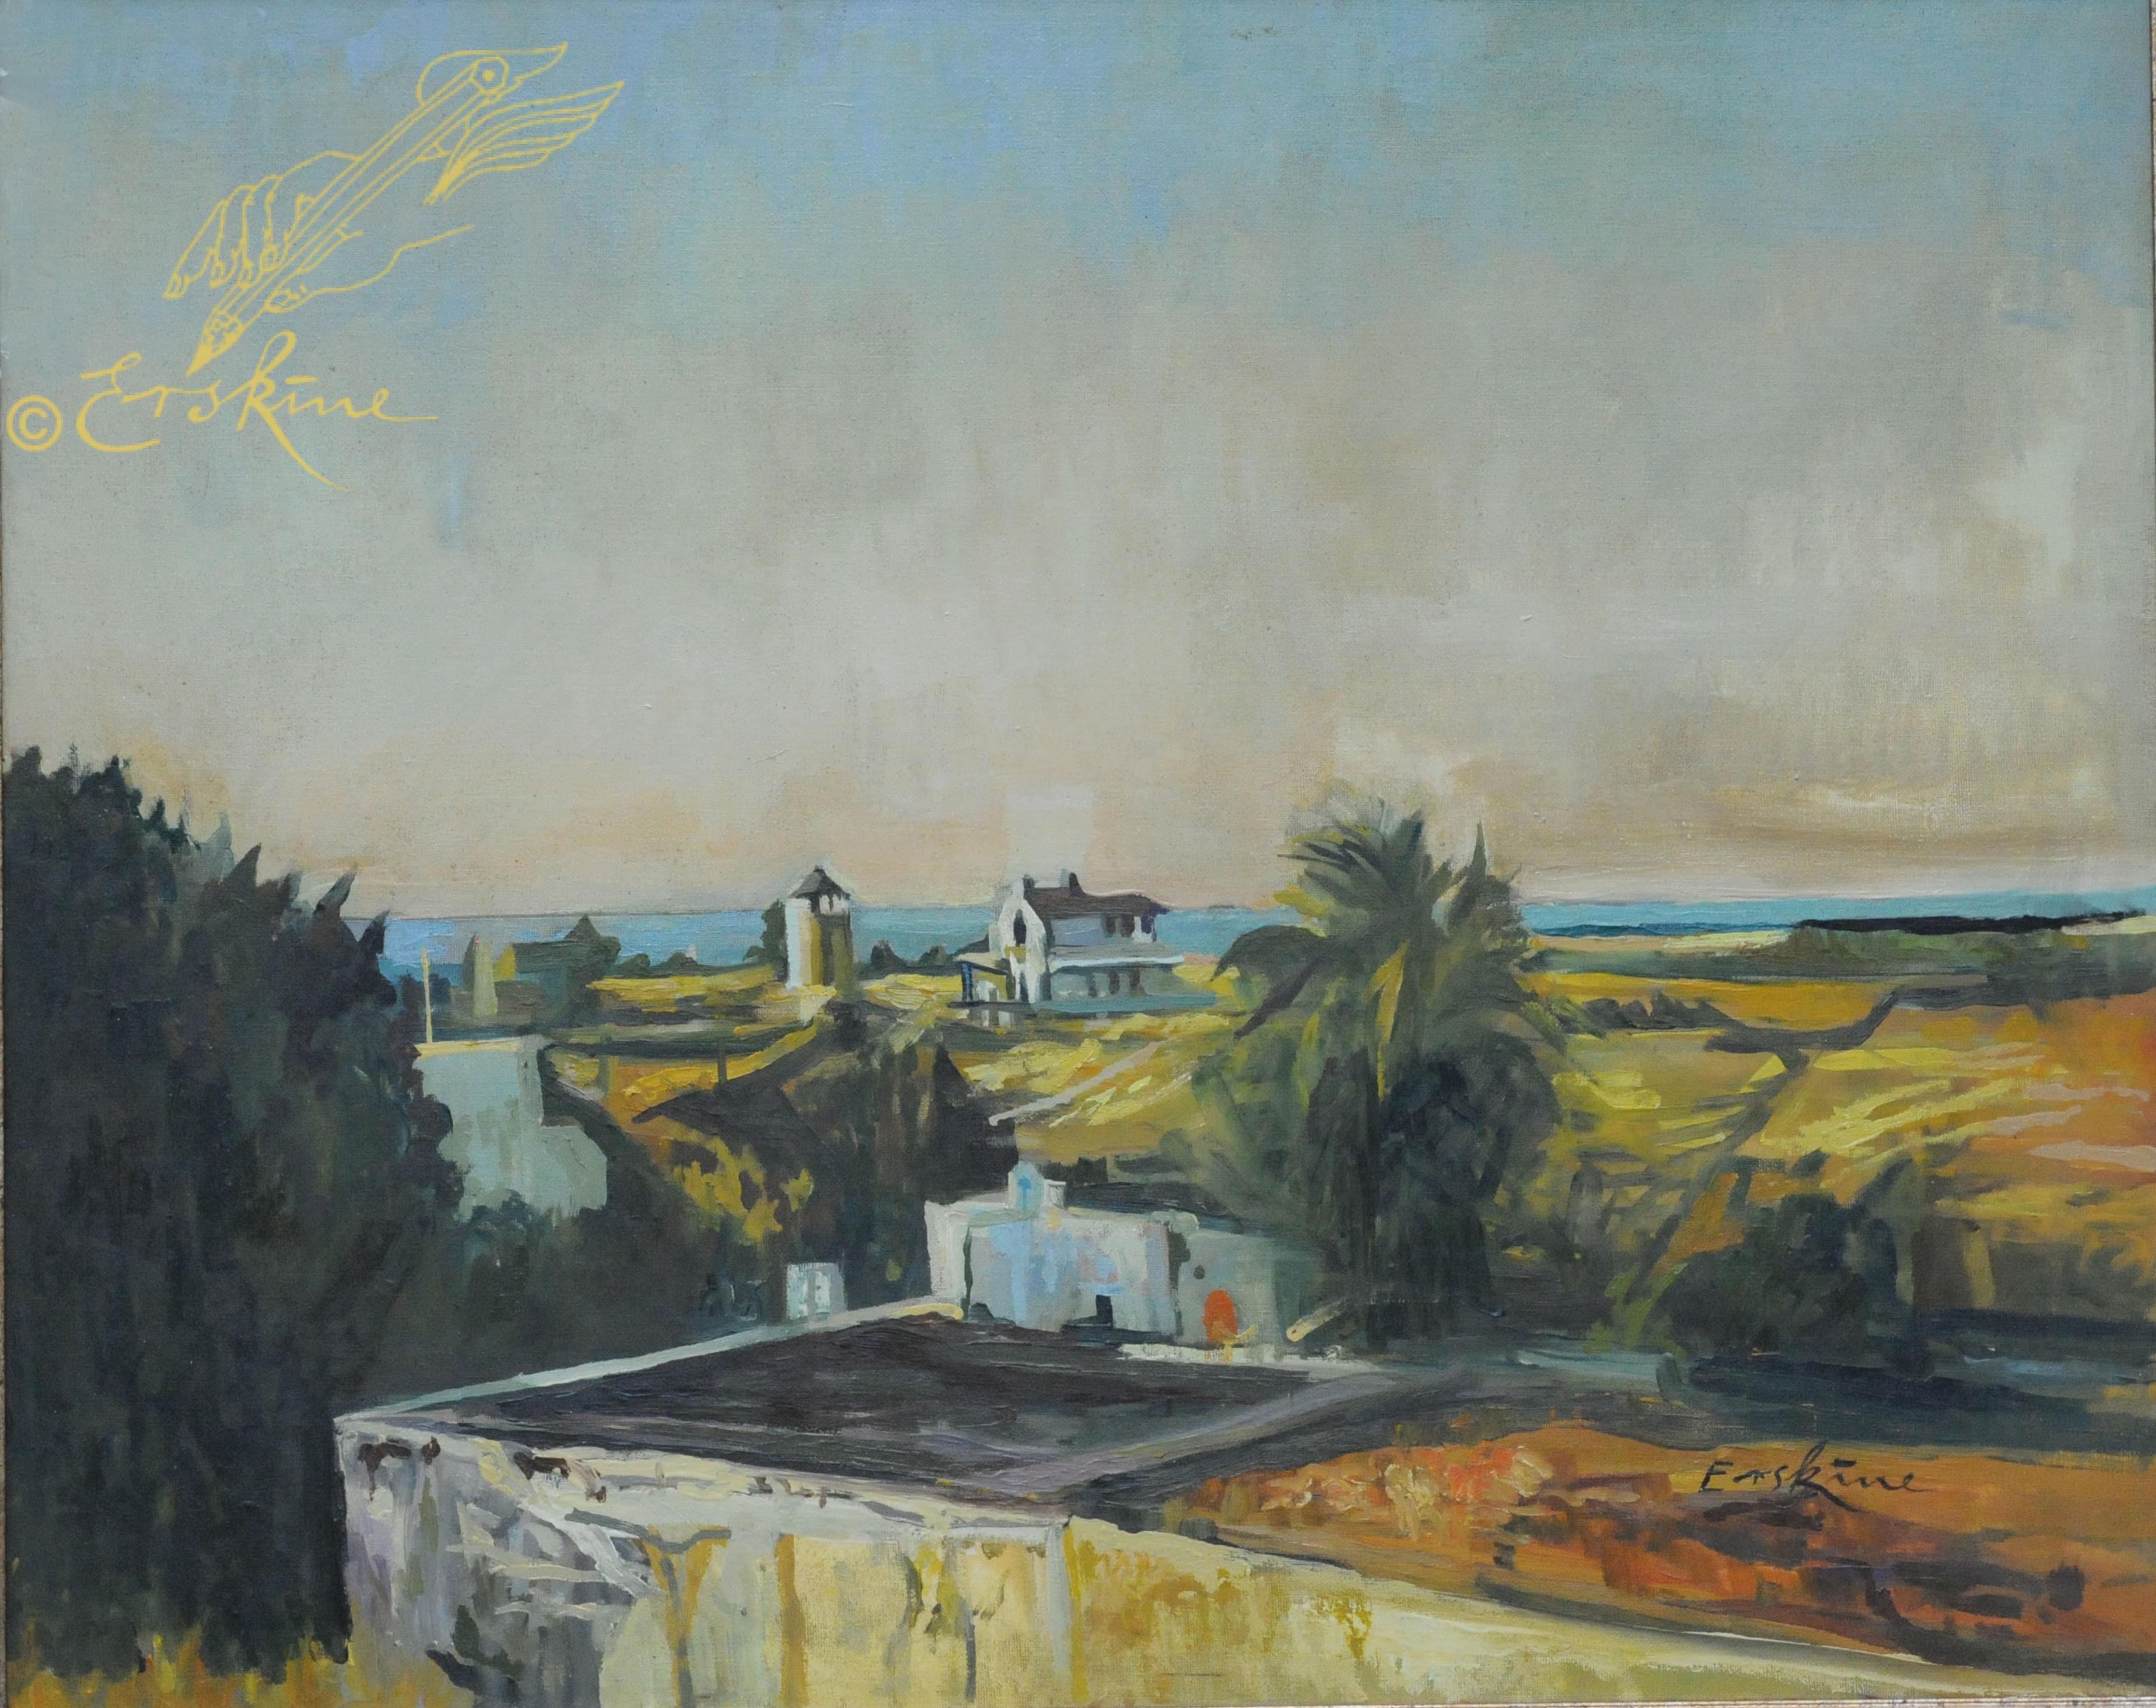 Avras Atalier